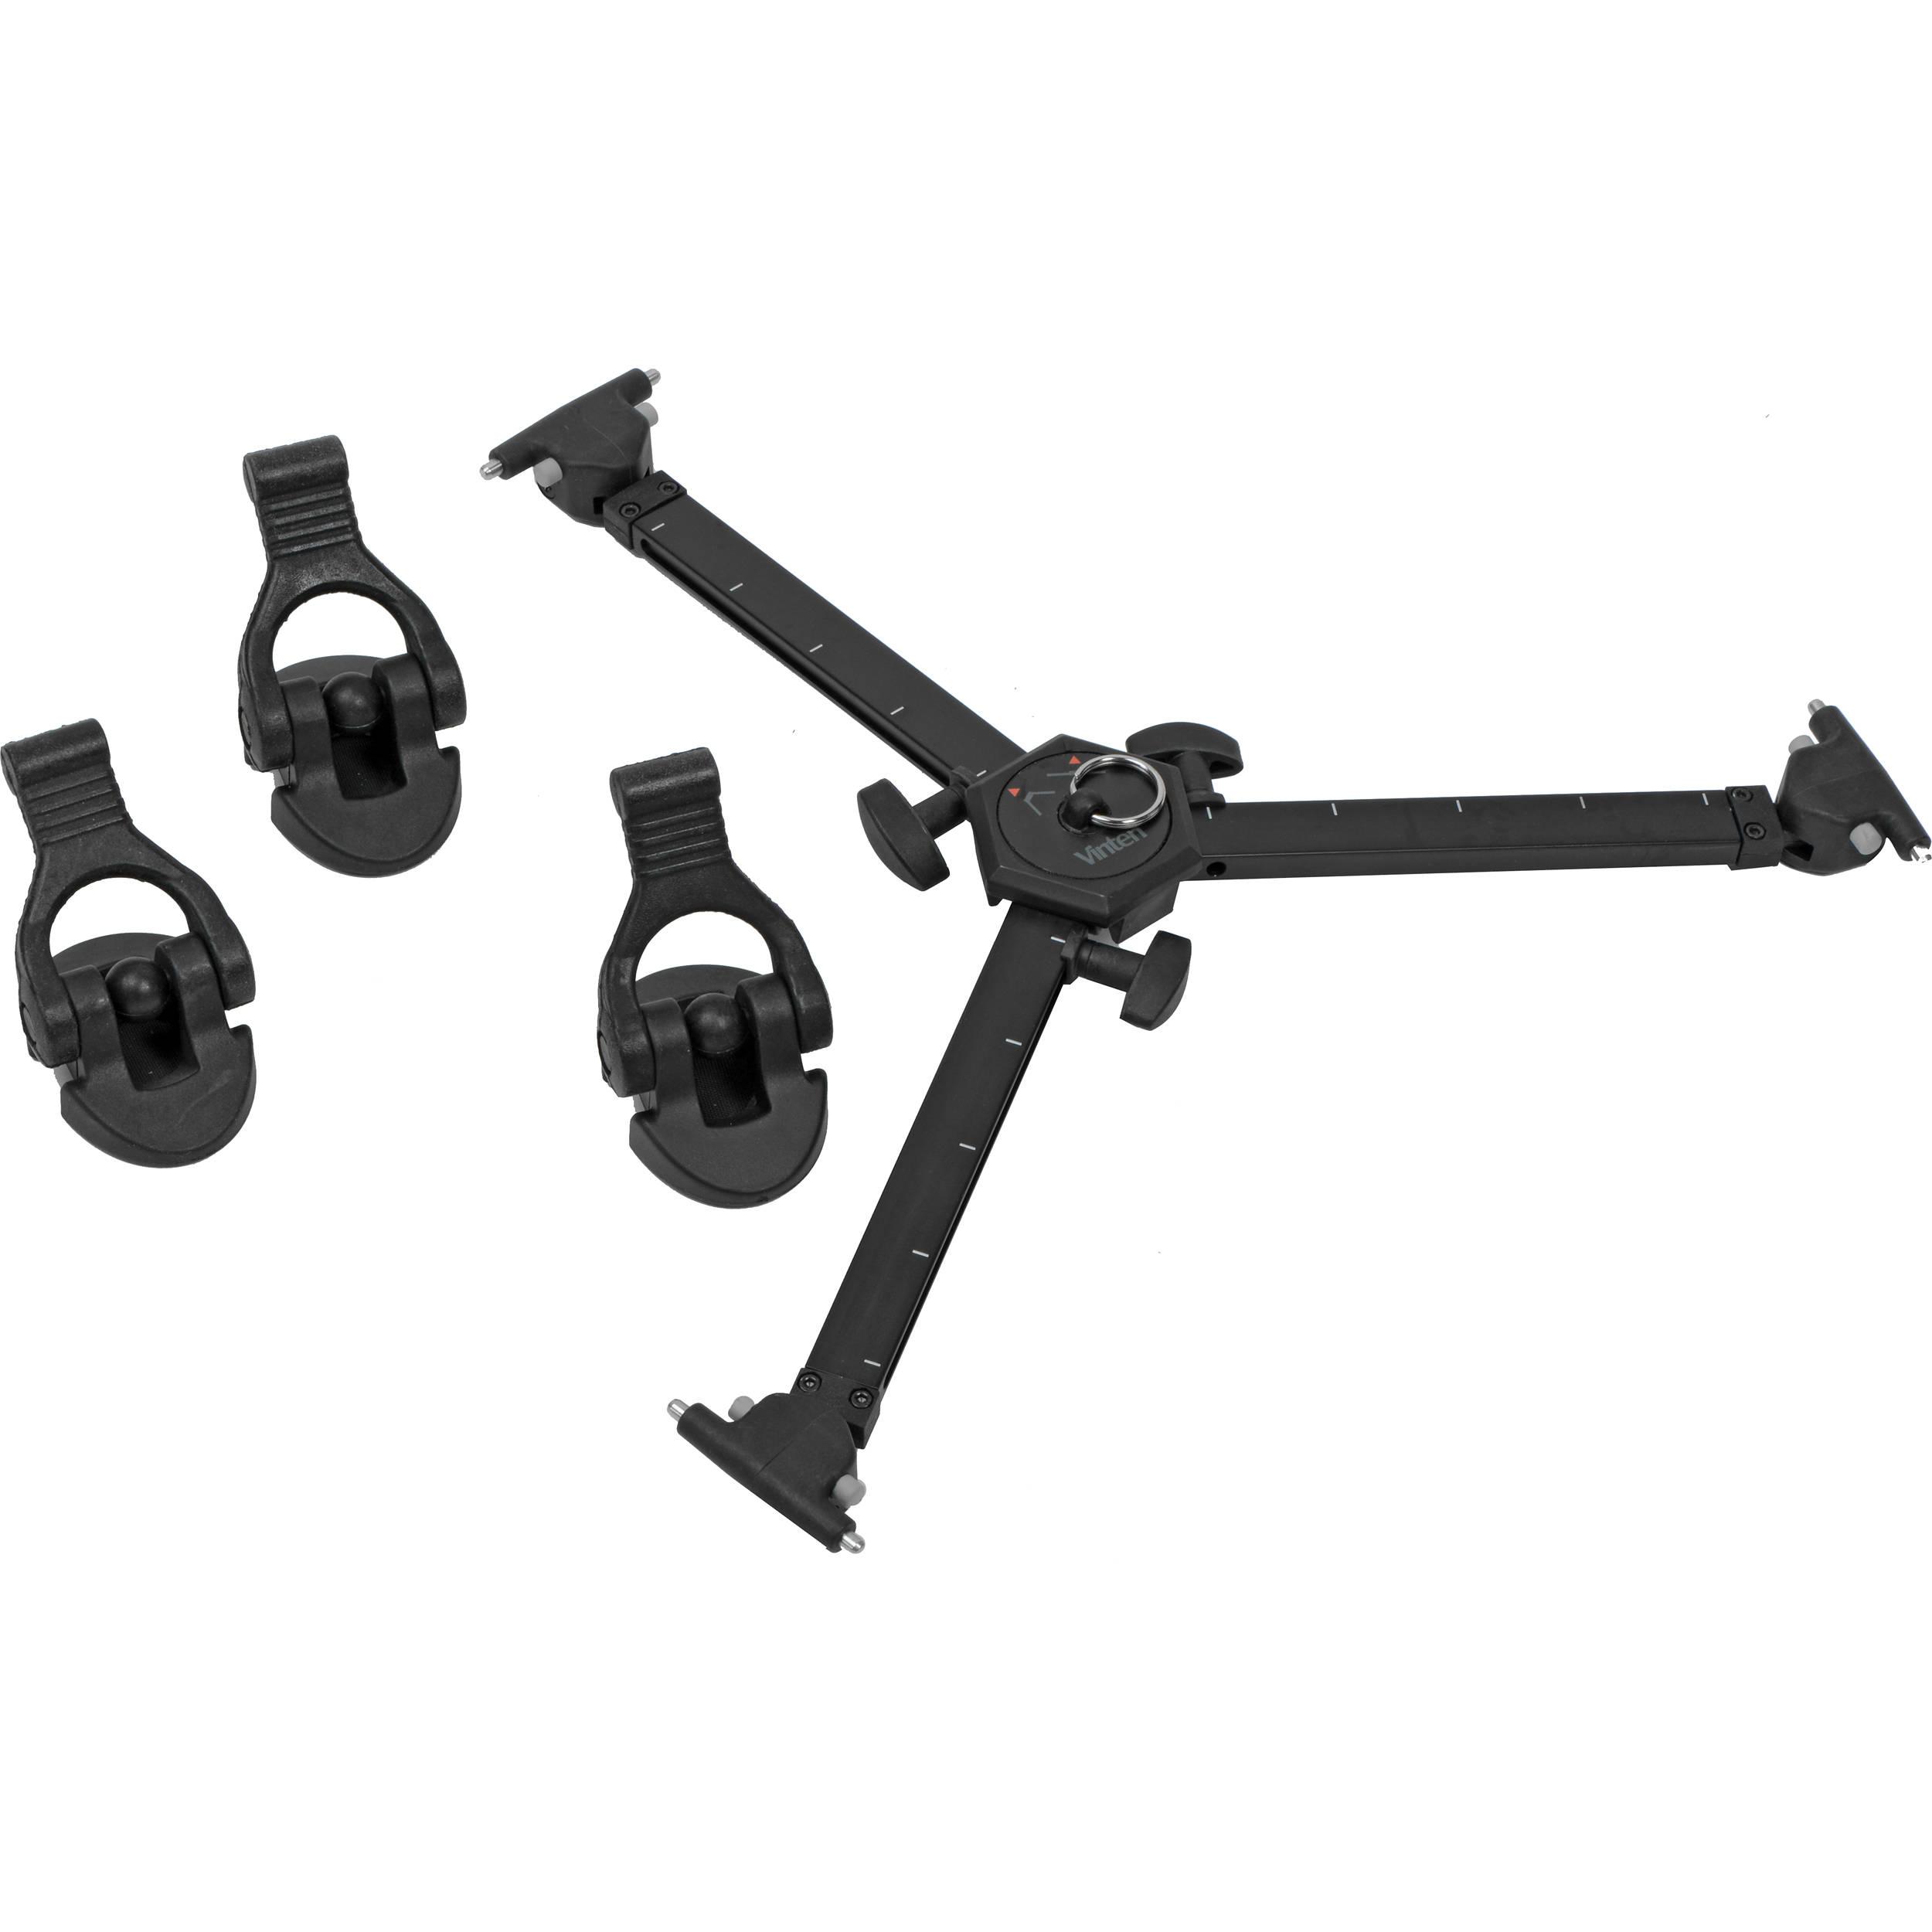 Vinten V4032-0001 ProTouch Mid-Level Spreader V4032-0001 B&H